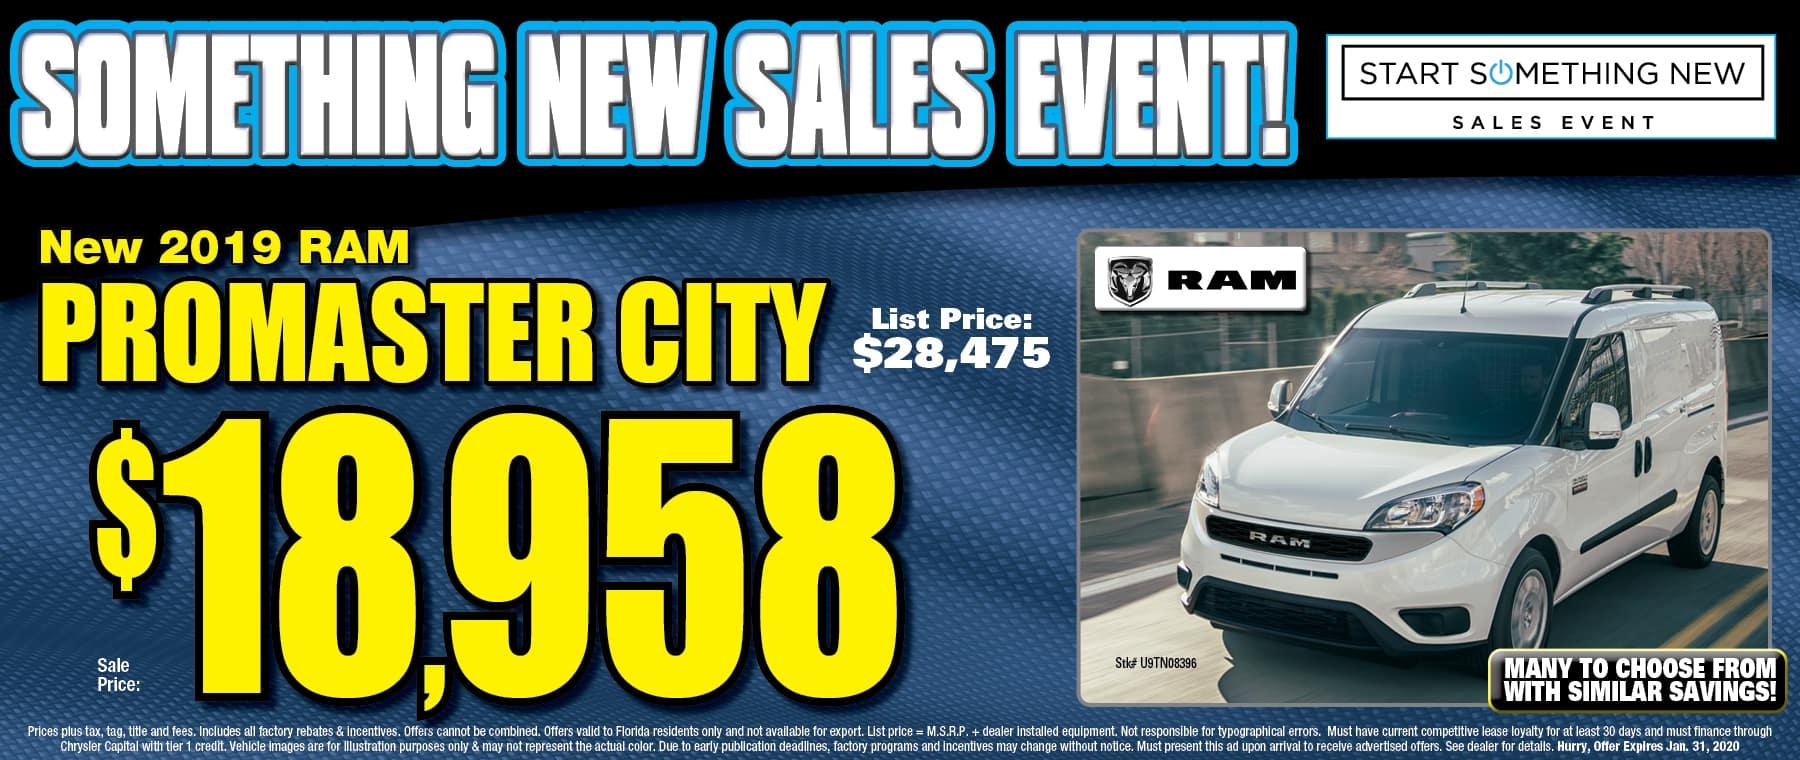 New Ram Promaster City!